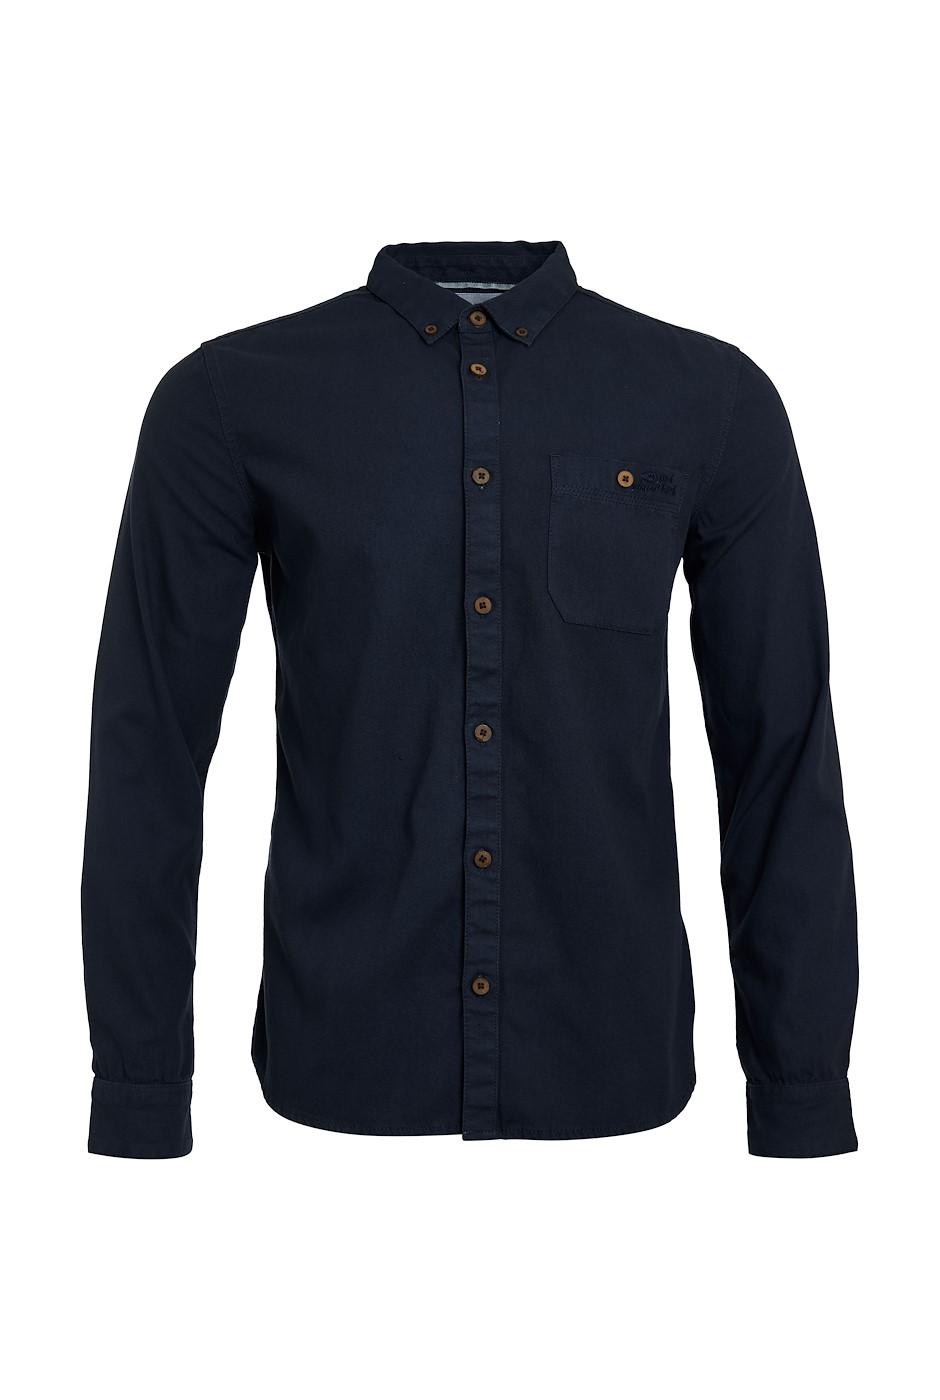 Stocker Long Sleeve Oxford Shirt Navy